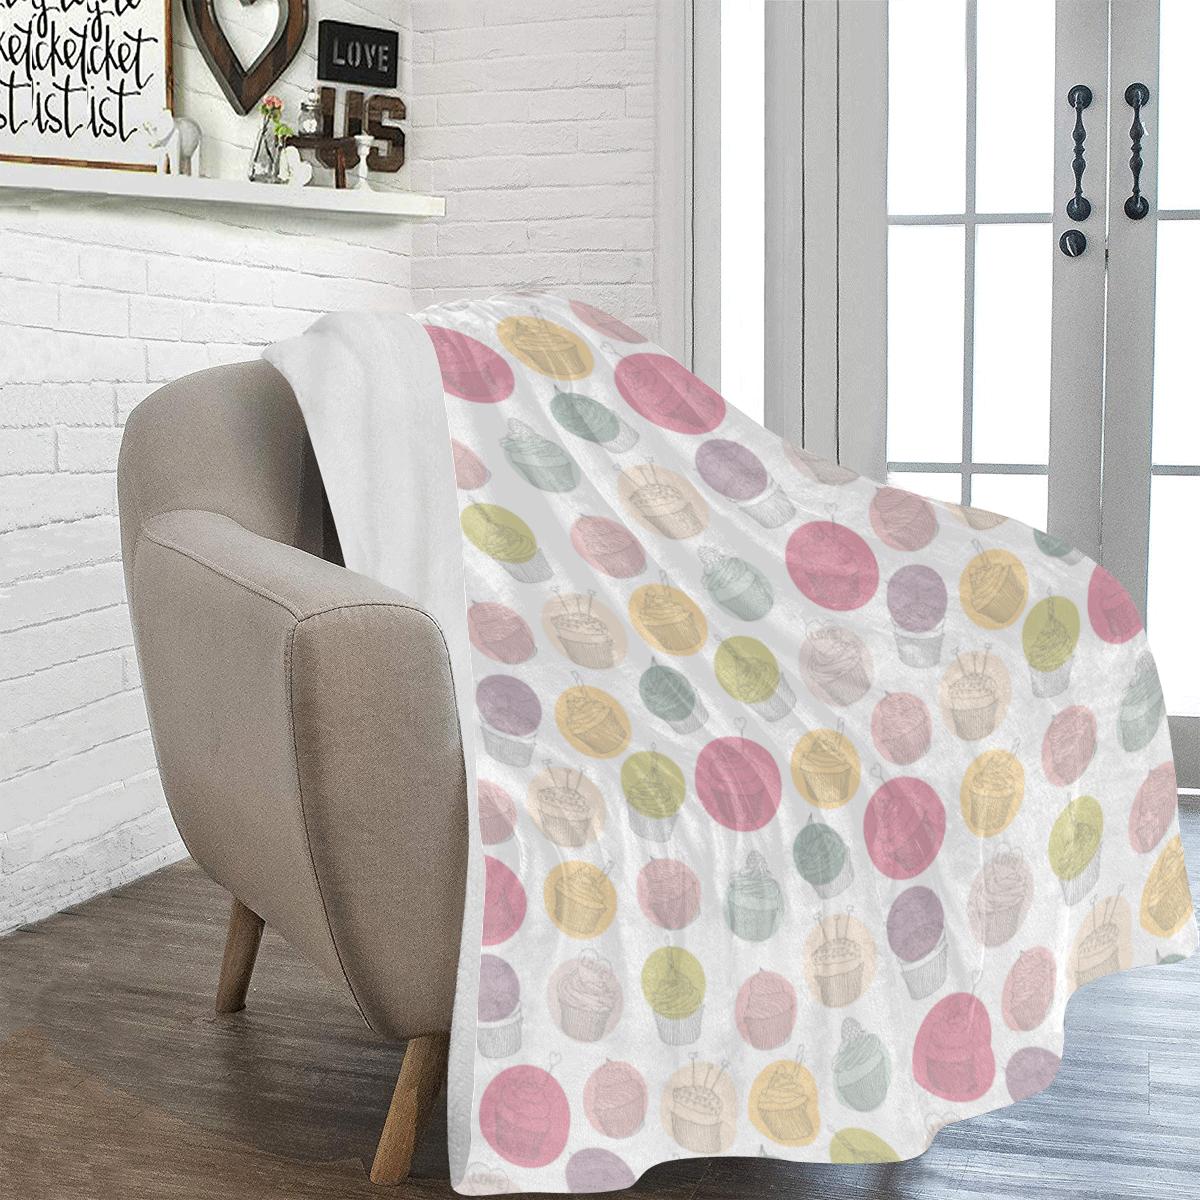 Colorful Cupcakes Ultra-Soft Micro Fleece Blanket 54''x70''